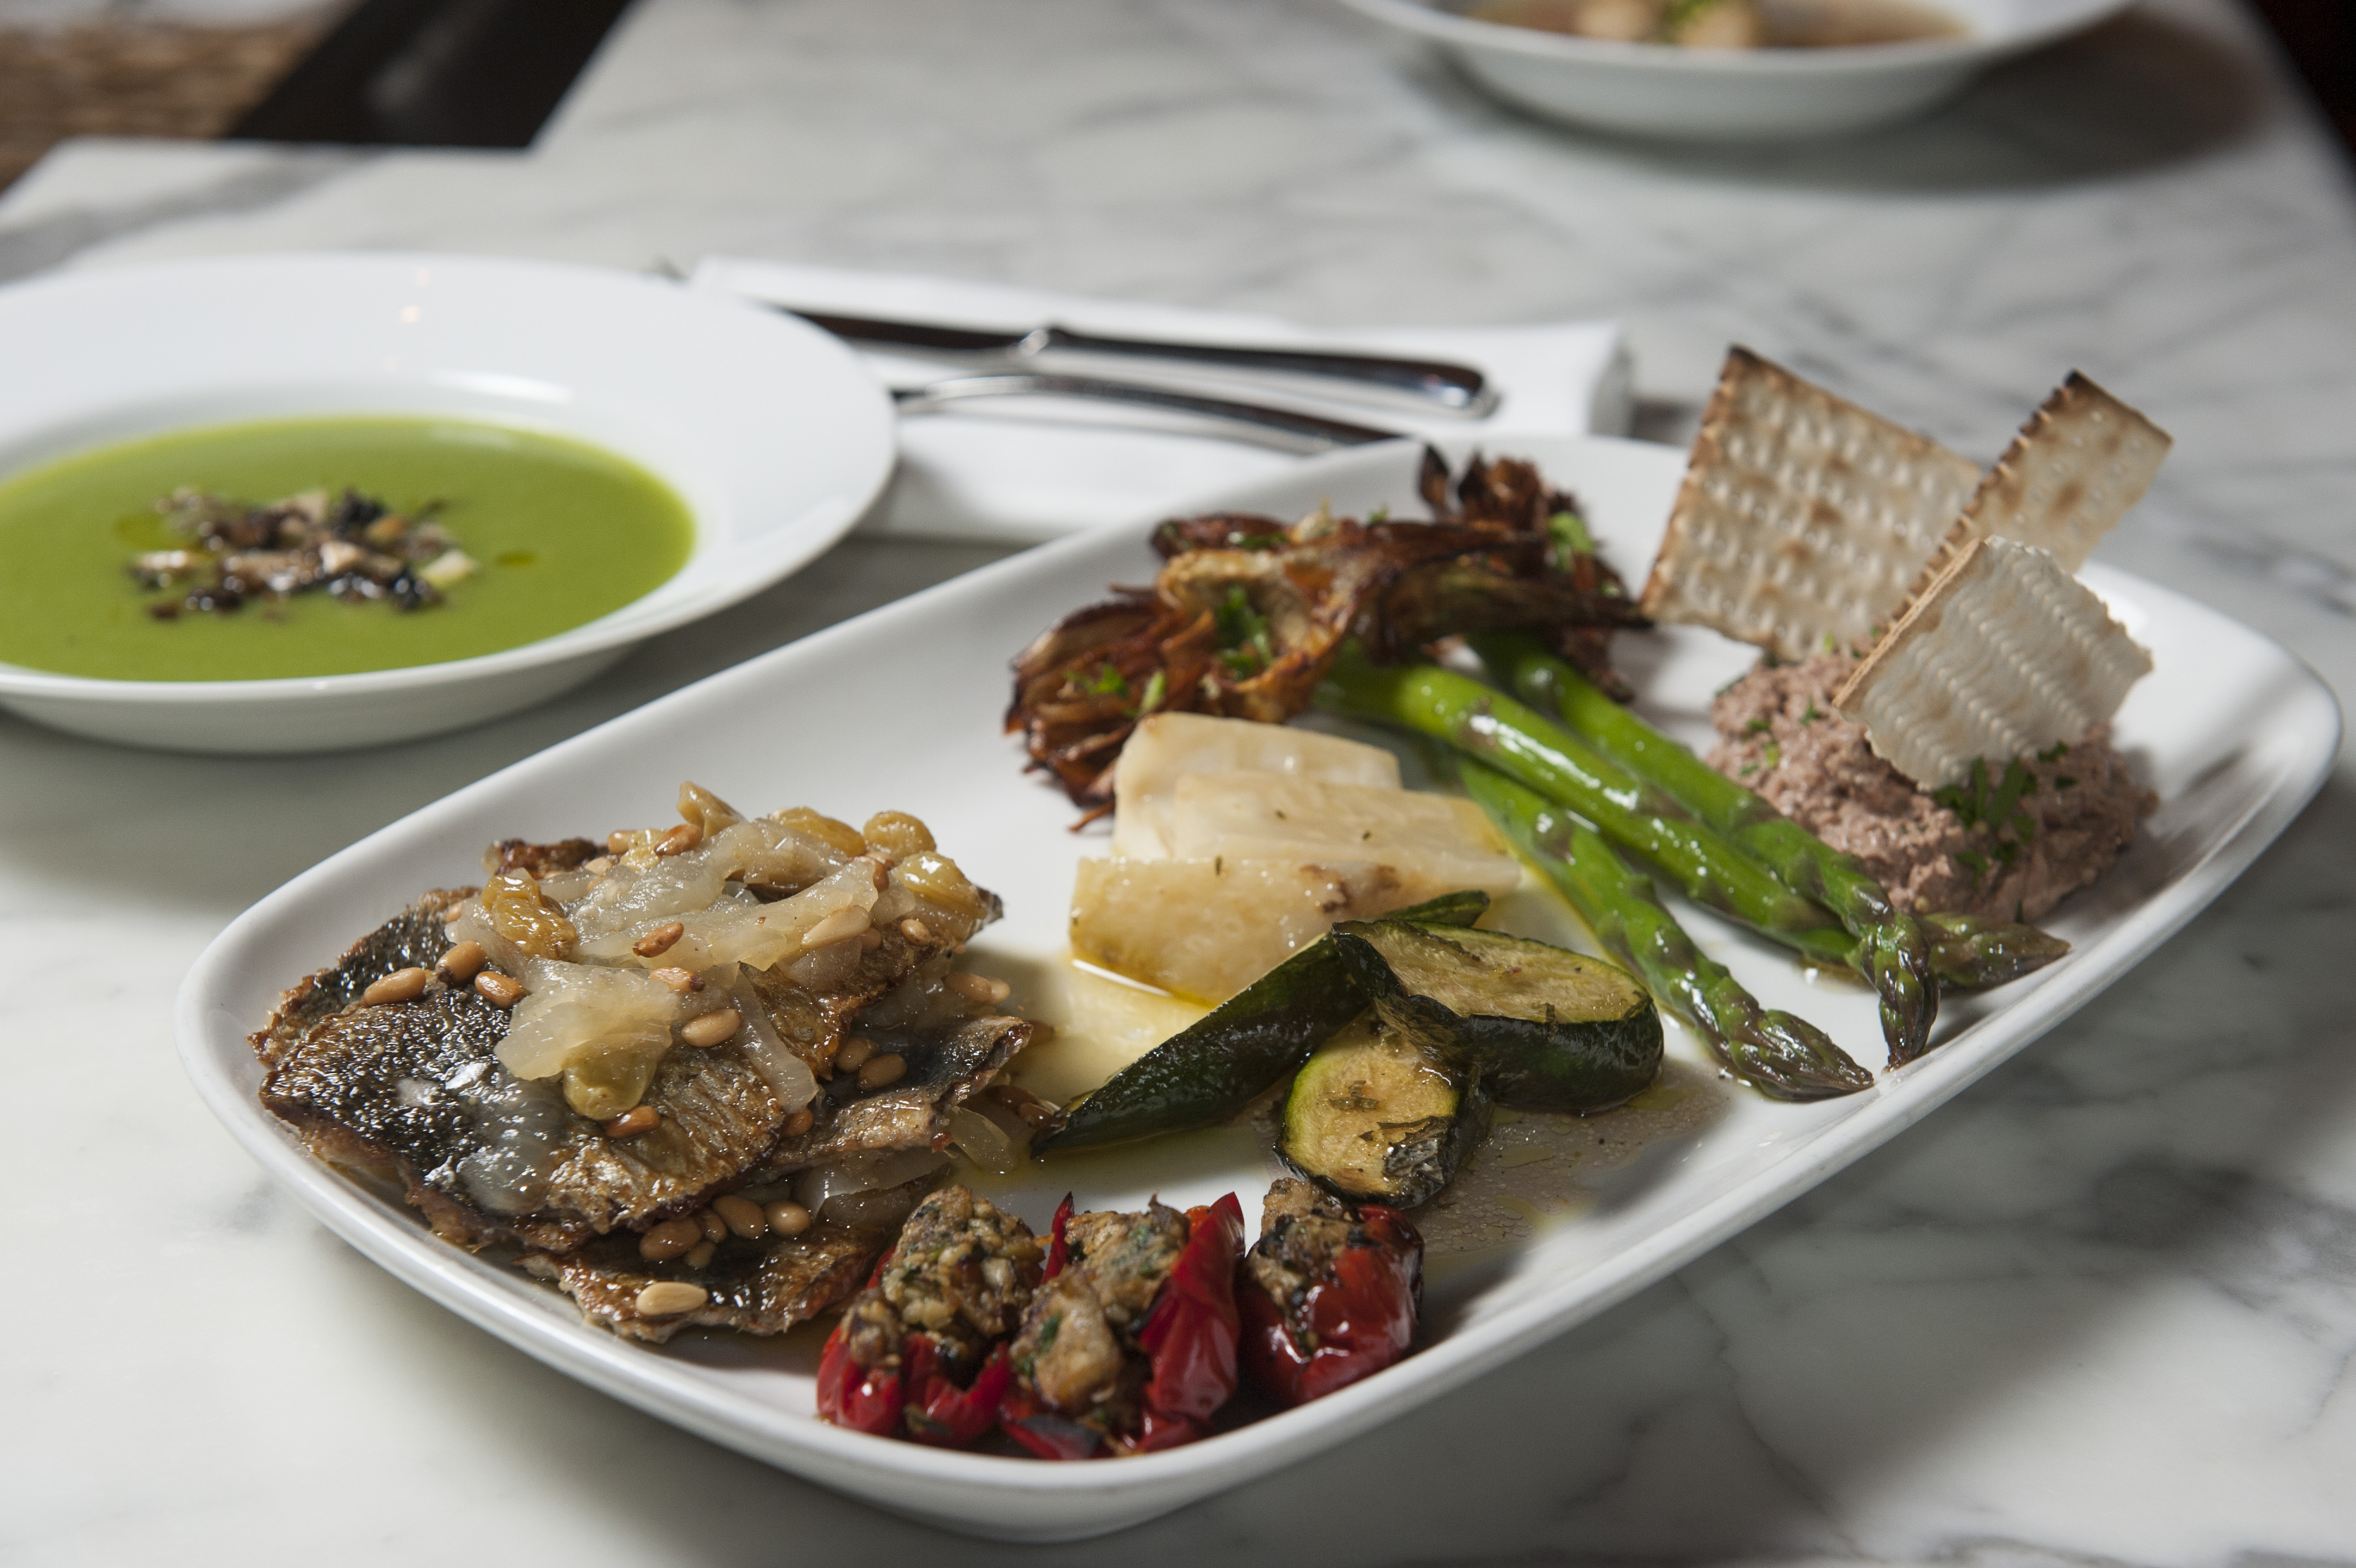 The passover spread at Perbacco